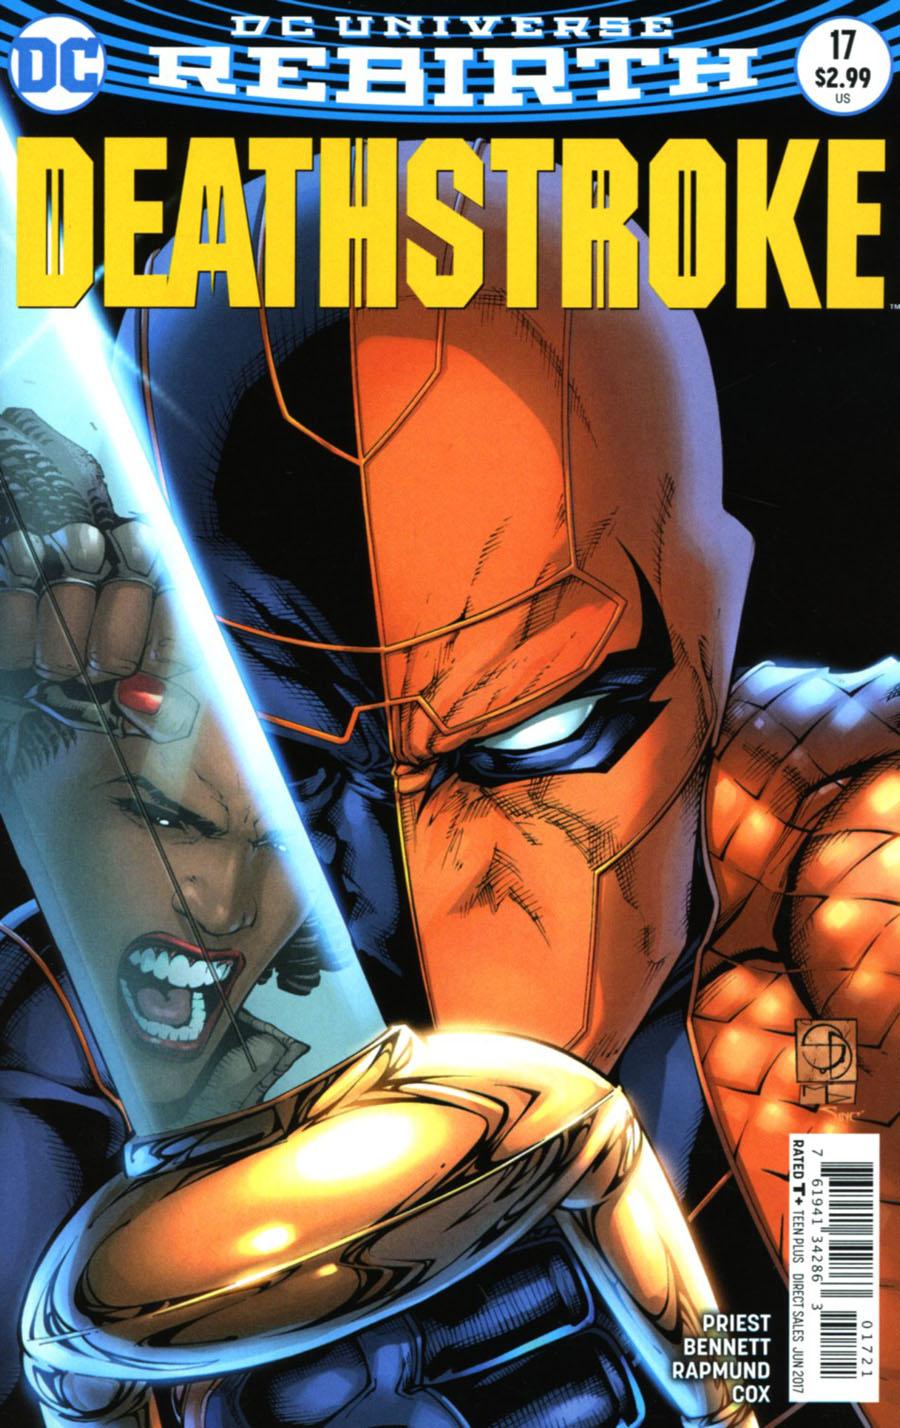 Deathstroke Vol 4 #17 Cover B Variant Shane Davis Cover